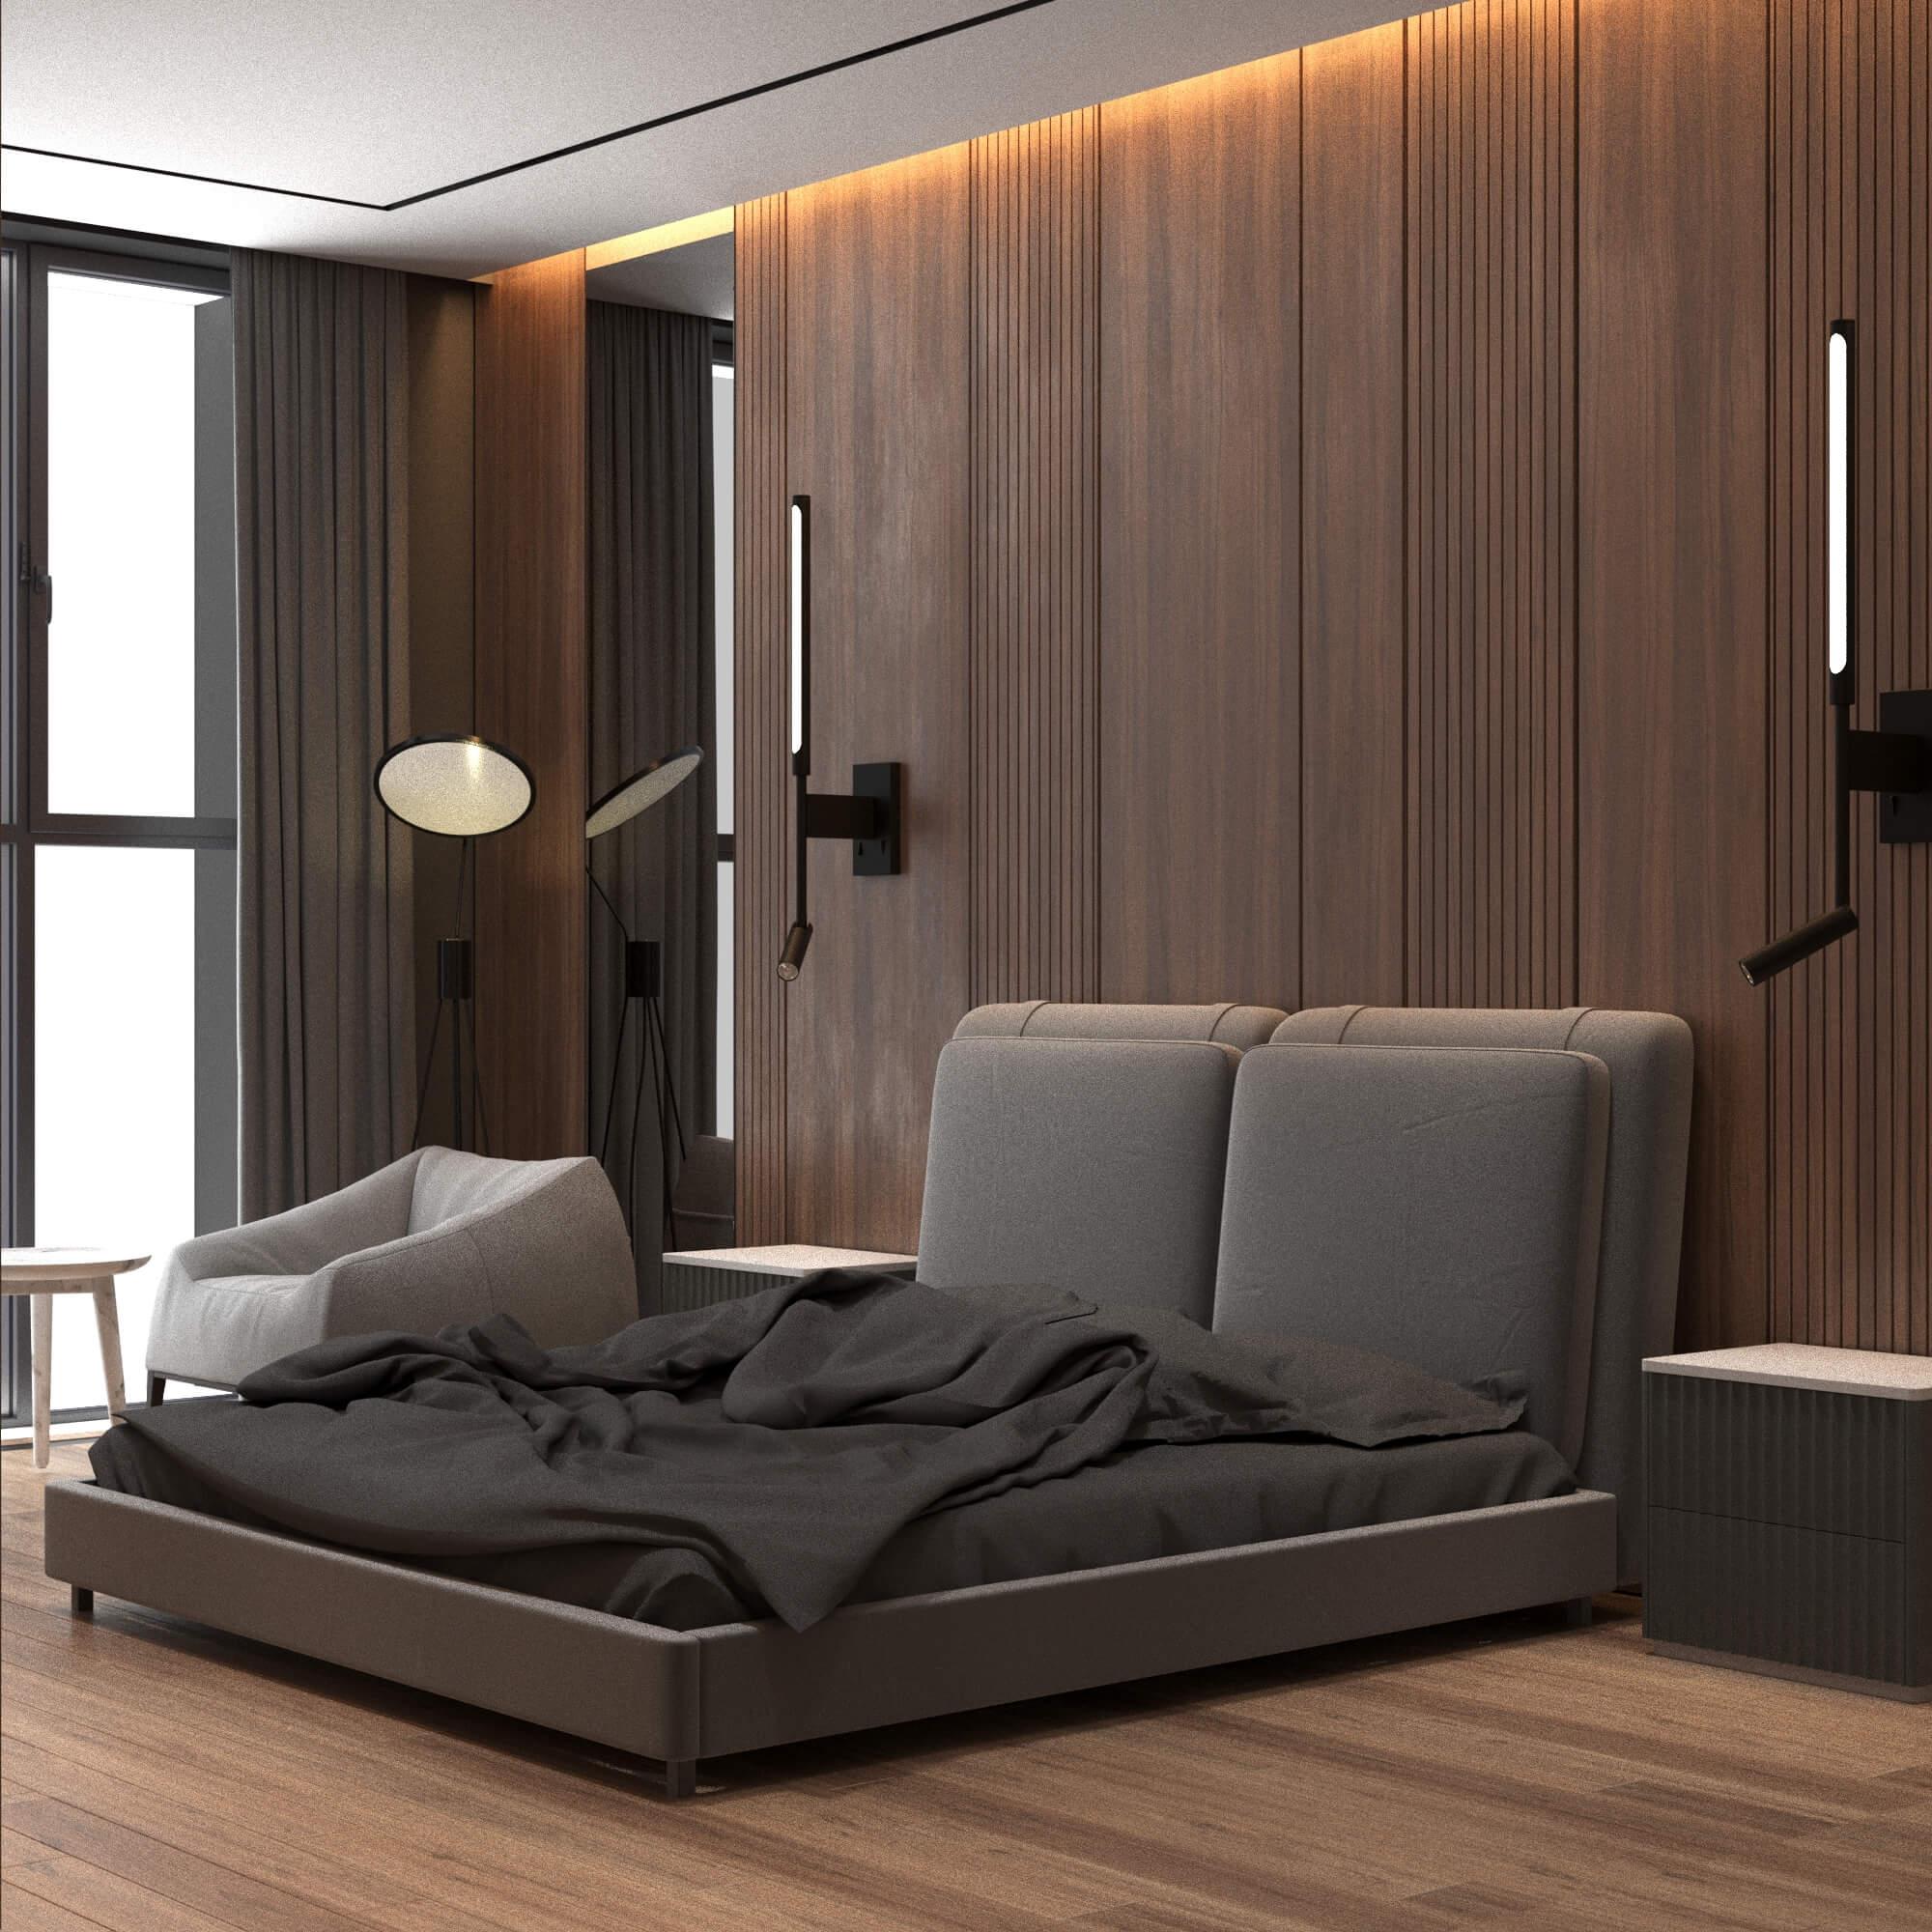 дизайн интерьера квартиры в Астане